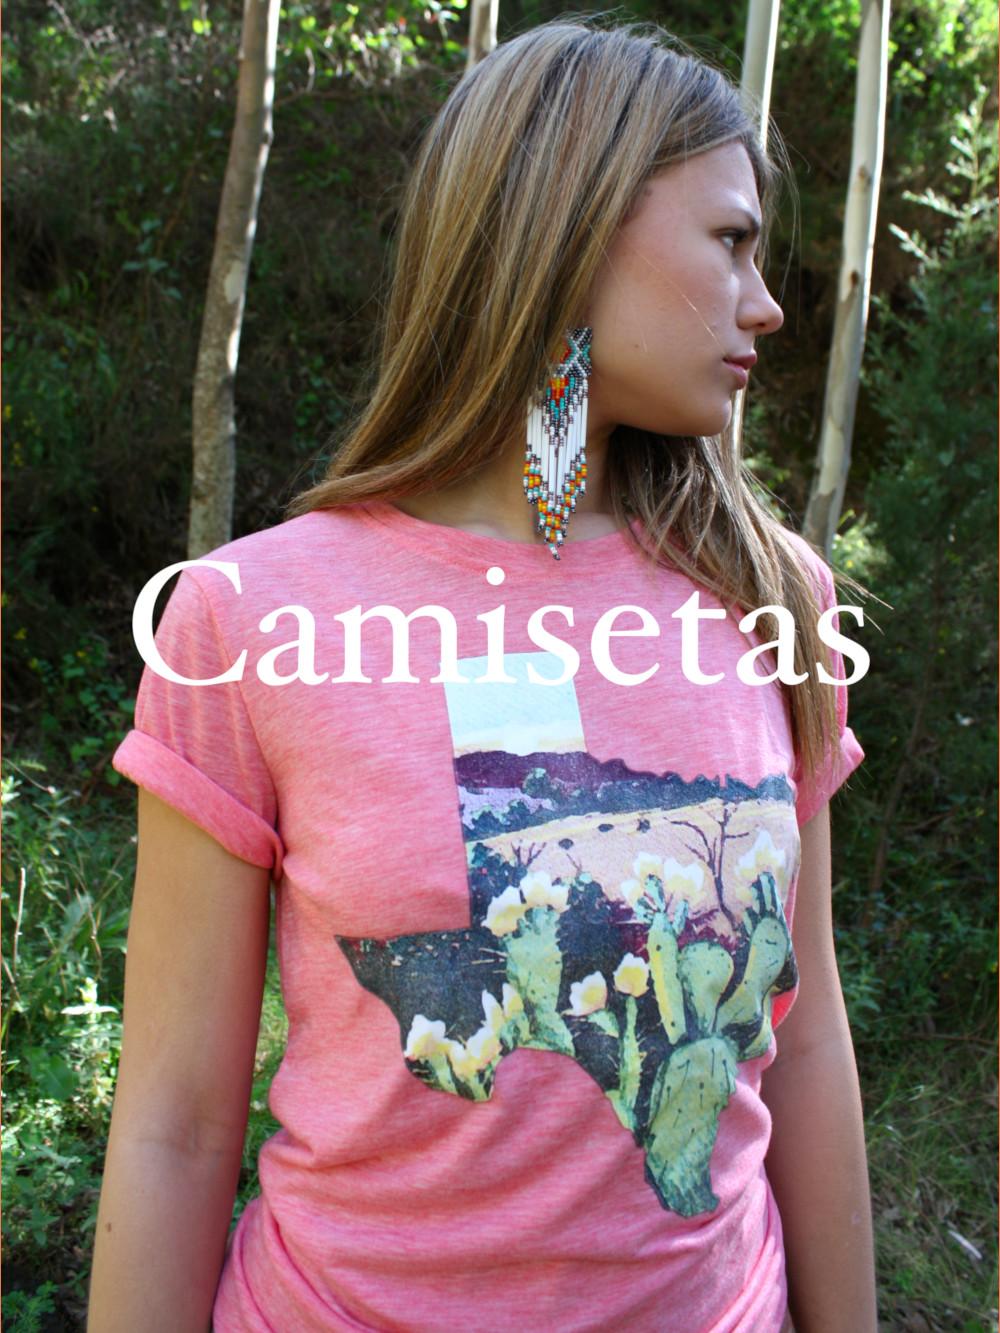 Camiseta Rosa Texas in Pink, camiseta estado de texas, camiseta texana, camiseta cowgirl, camiseta boho, camiseta bohochic, camiseta coachella, camiseta boho, camiseta cactus, cowgirl, westernchic